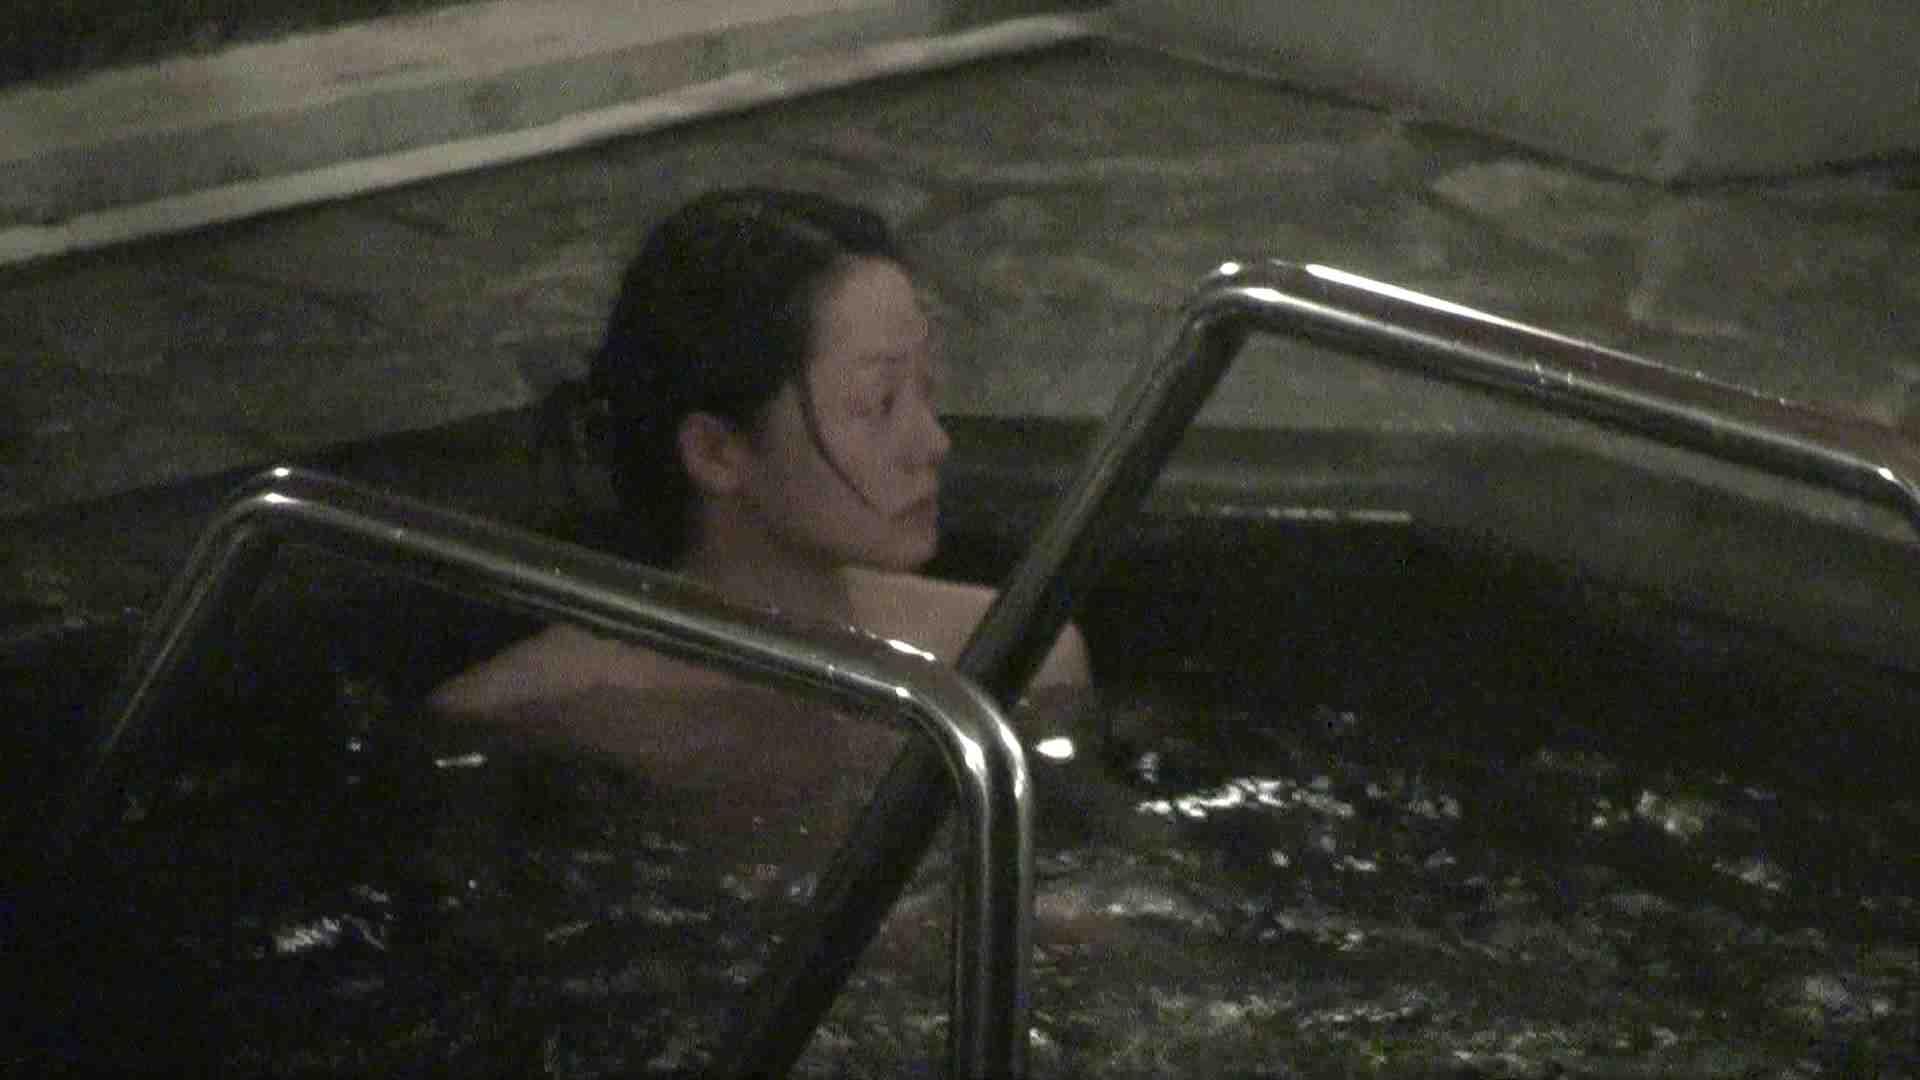 Aquaな露天風呂Vol.318 OLセックス 盗み撮りSEX無修正画像 48画像 41